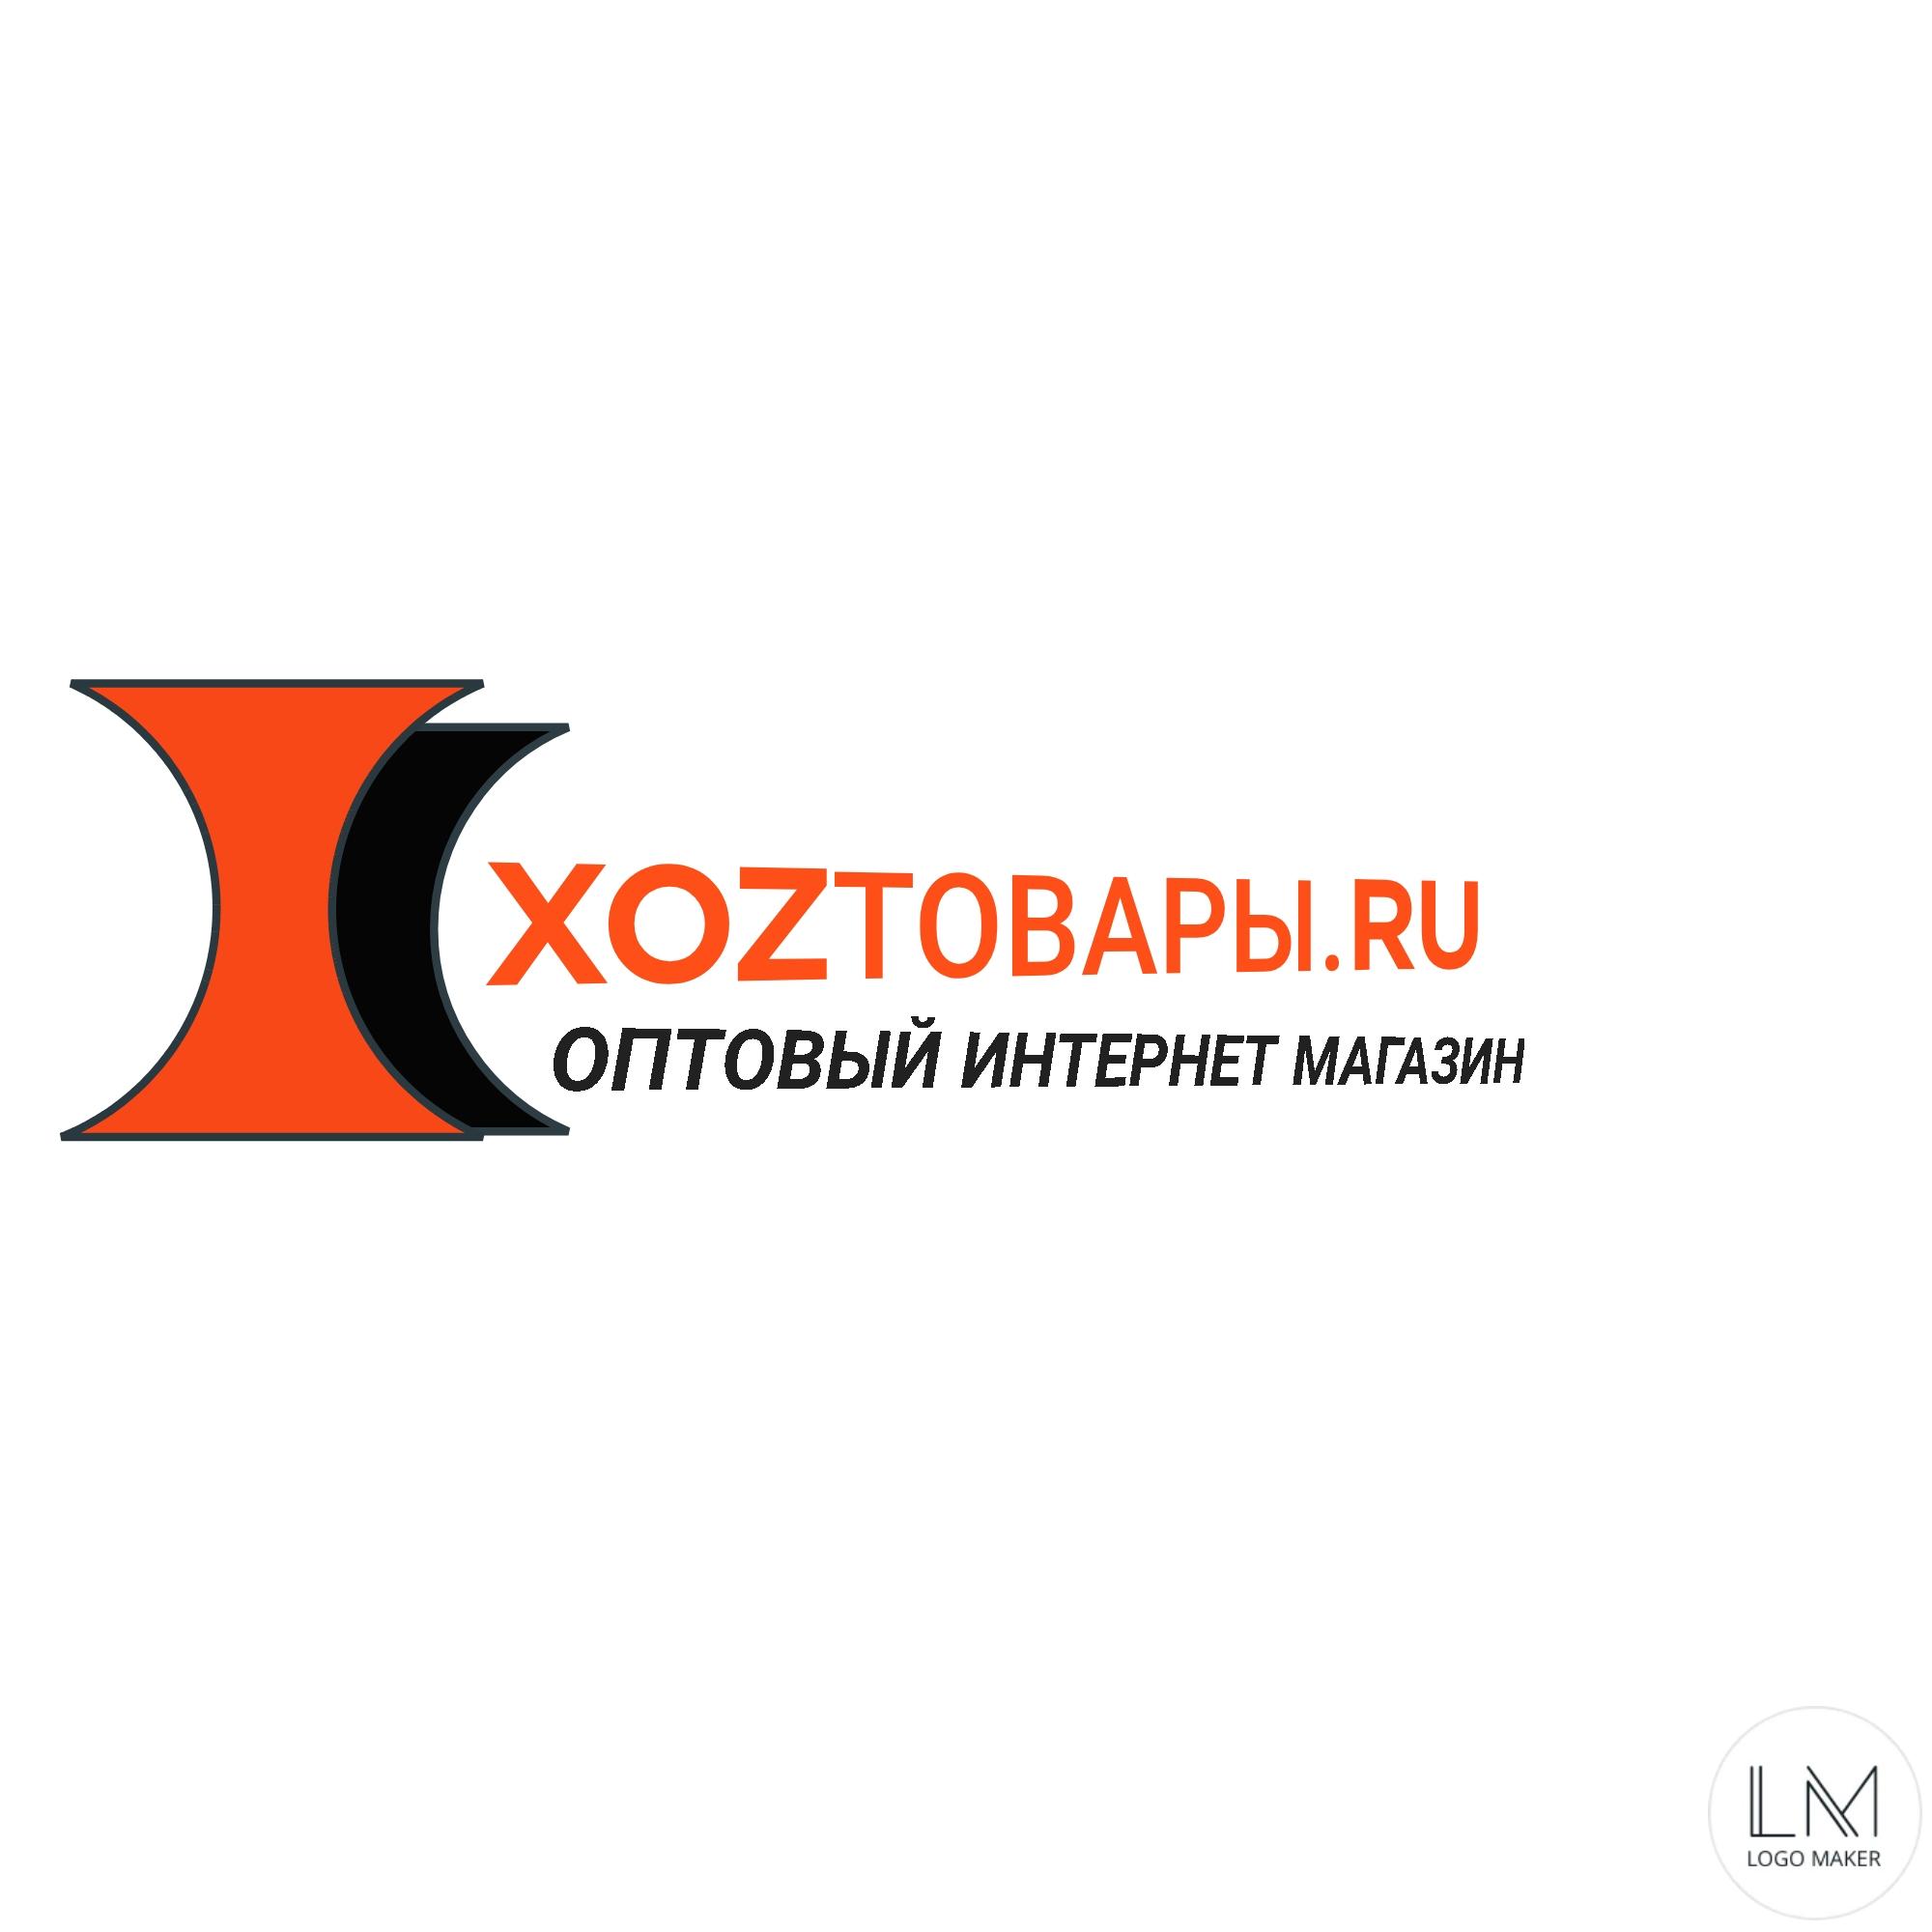 Разработка логотипа для оптового интернет-магазина «Хозтовары.ру» фото f_2016070b8ec57f9a.jpg